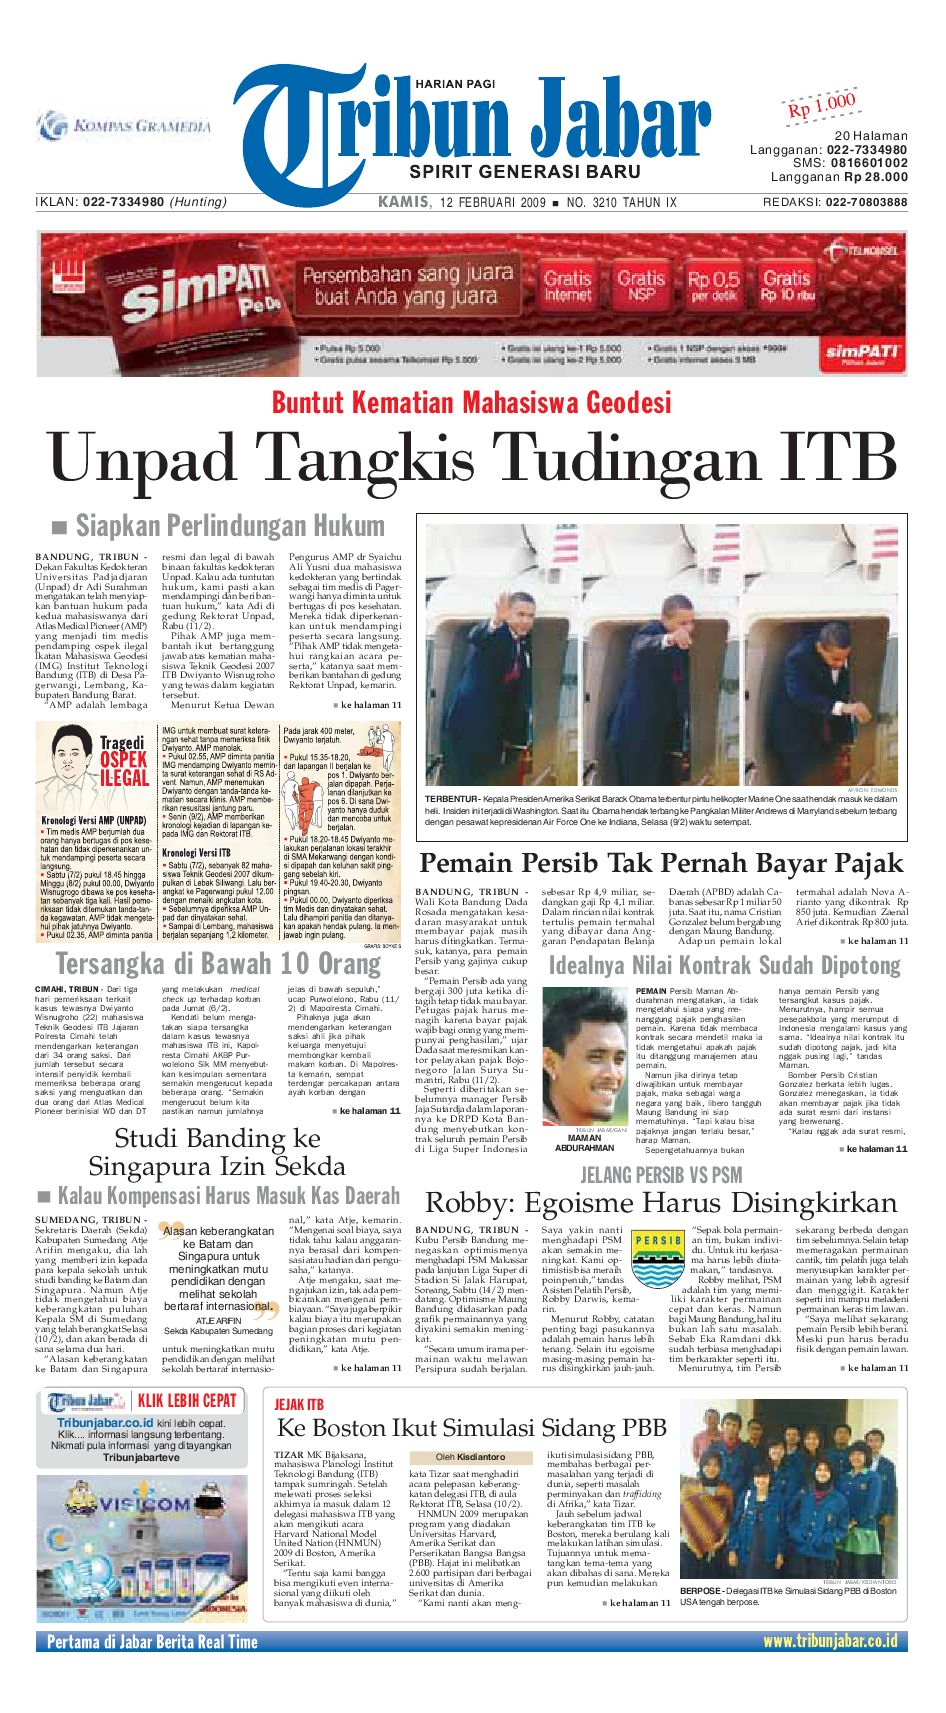 Edisi 3210 Tahun Ix By Tribun Jabar Issuu Strong Kangen Water Ph 115 Ukuran 1000 Ml Terapi Air Kelas Dunia Indonesia